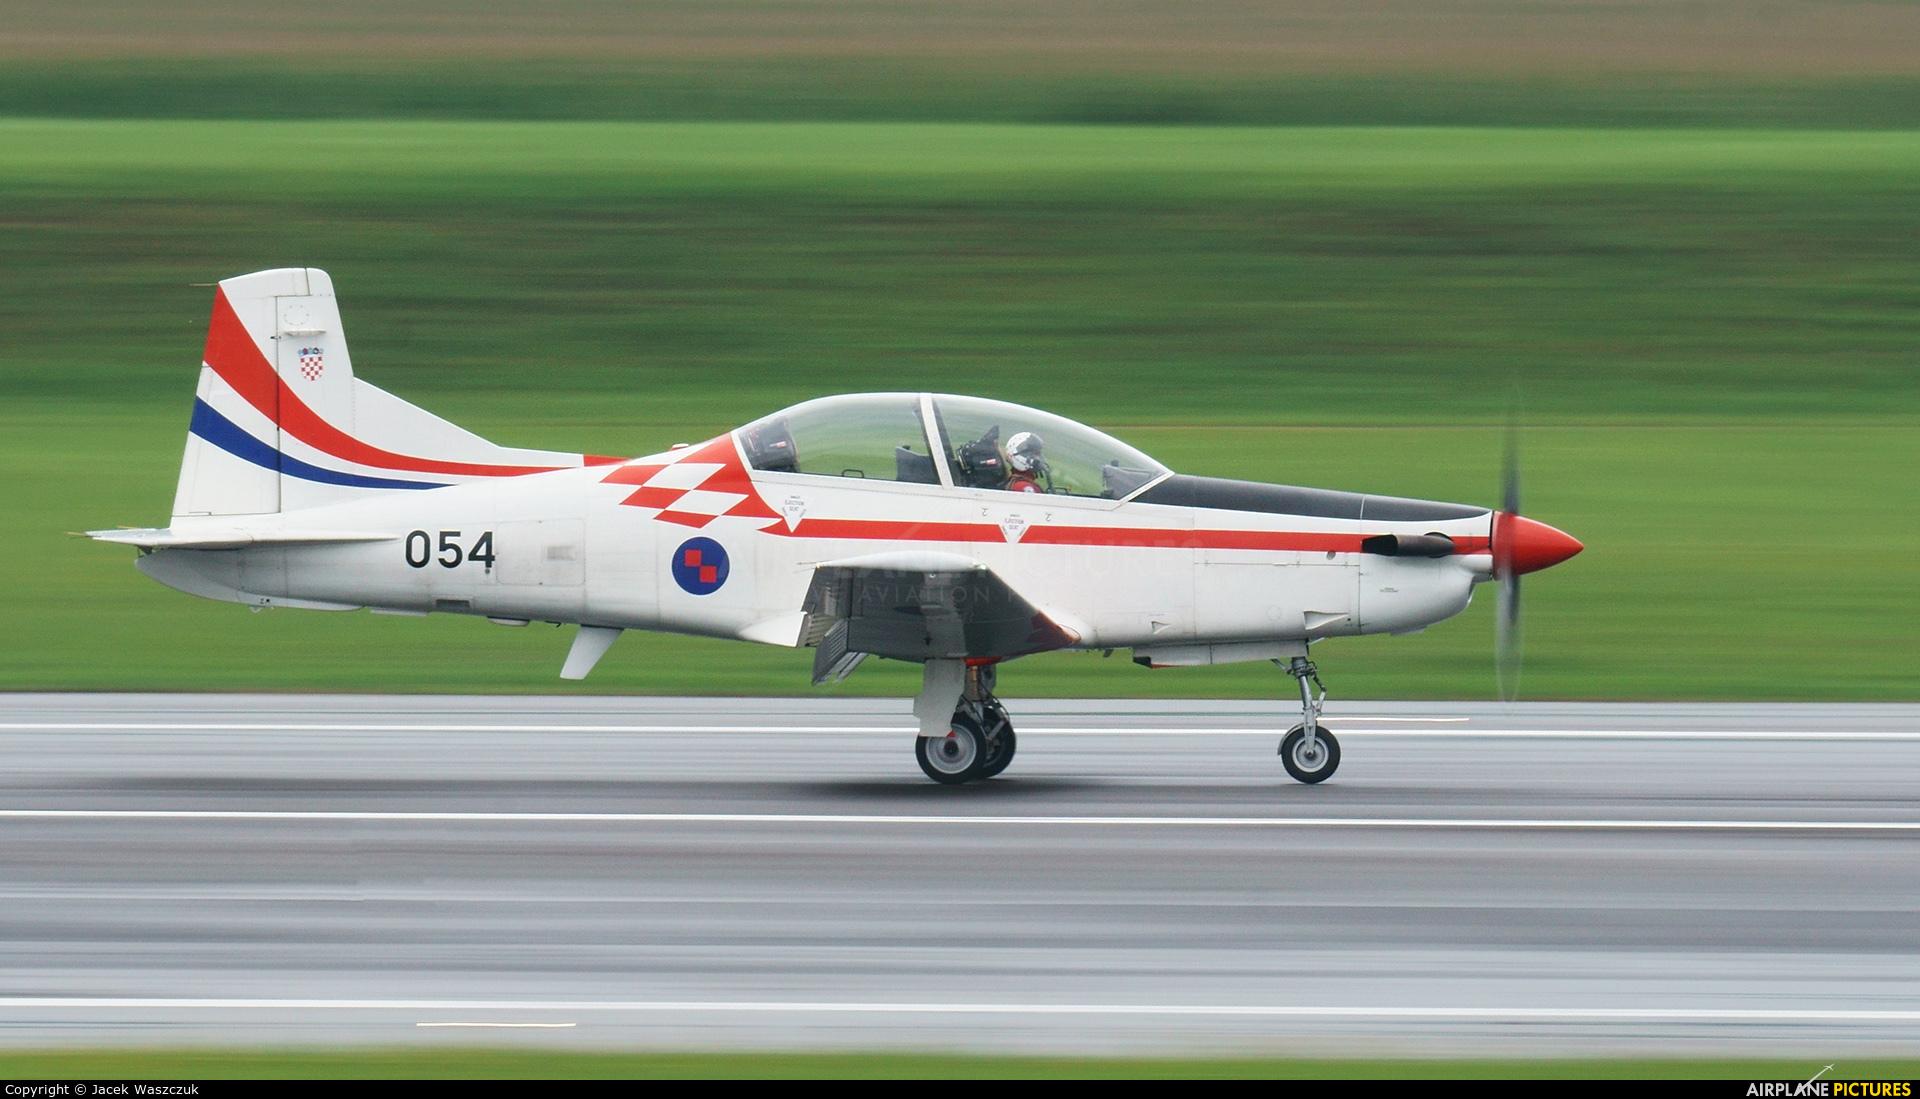 Croatia - Air Force 054 aircraft at Zeltweg